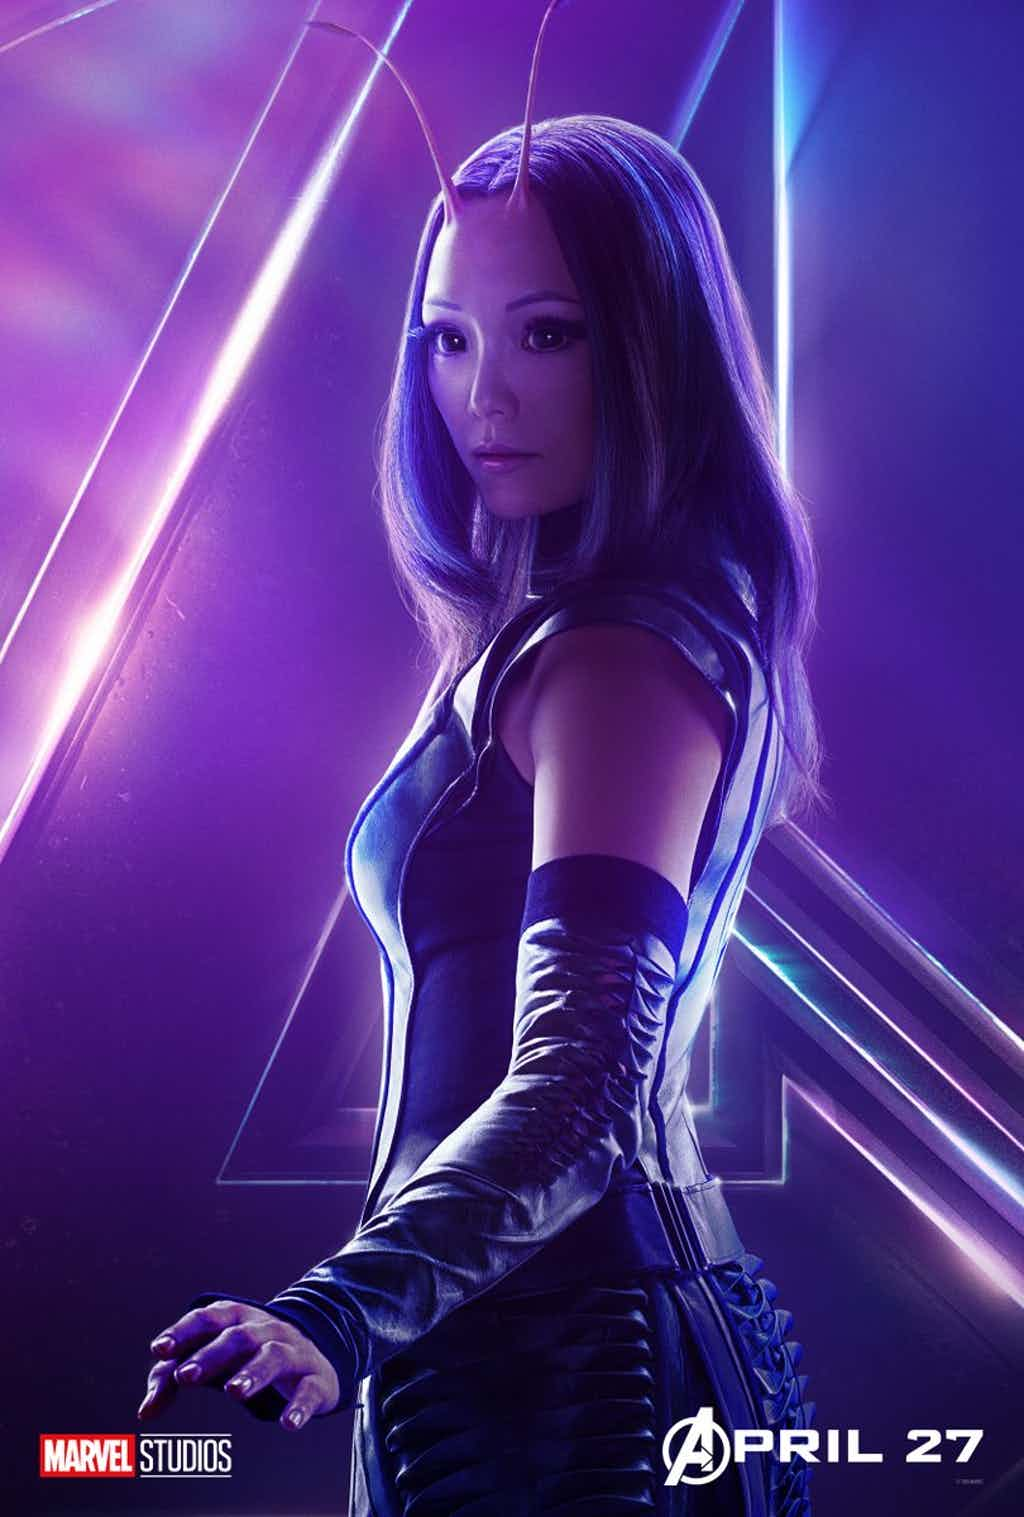 szmk_marvel_infinity_war_vegtelen_haboru_bosszuallok_avengers_ironman_hulk_thor_captainamaerica_guardians_galaxy_10.jpg